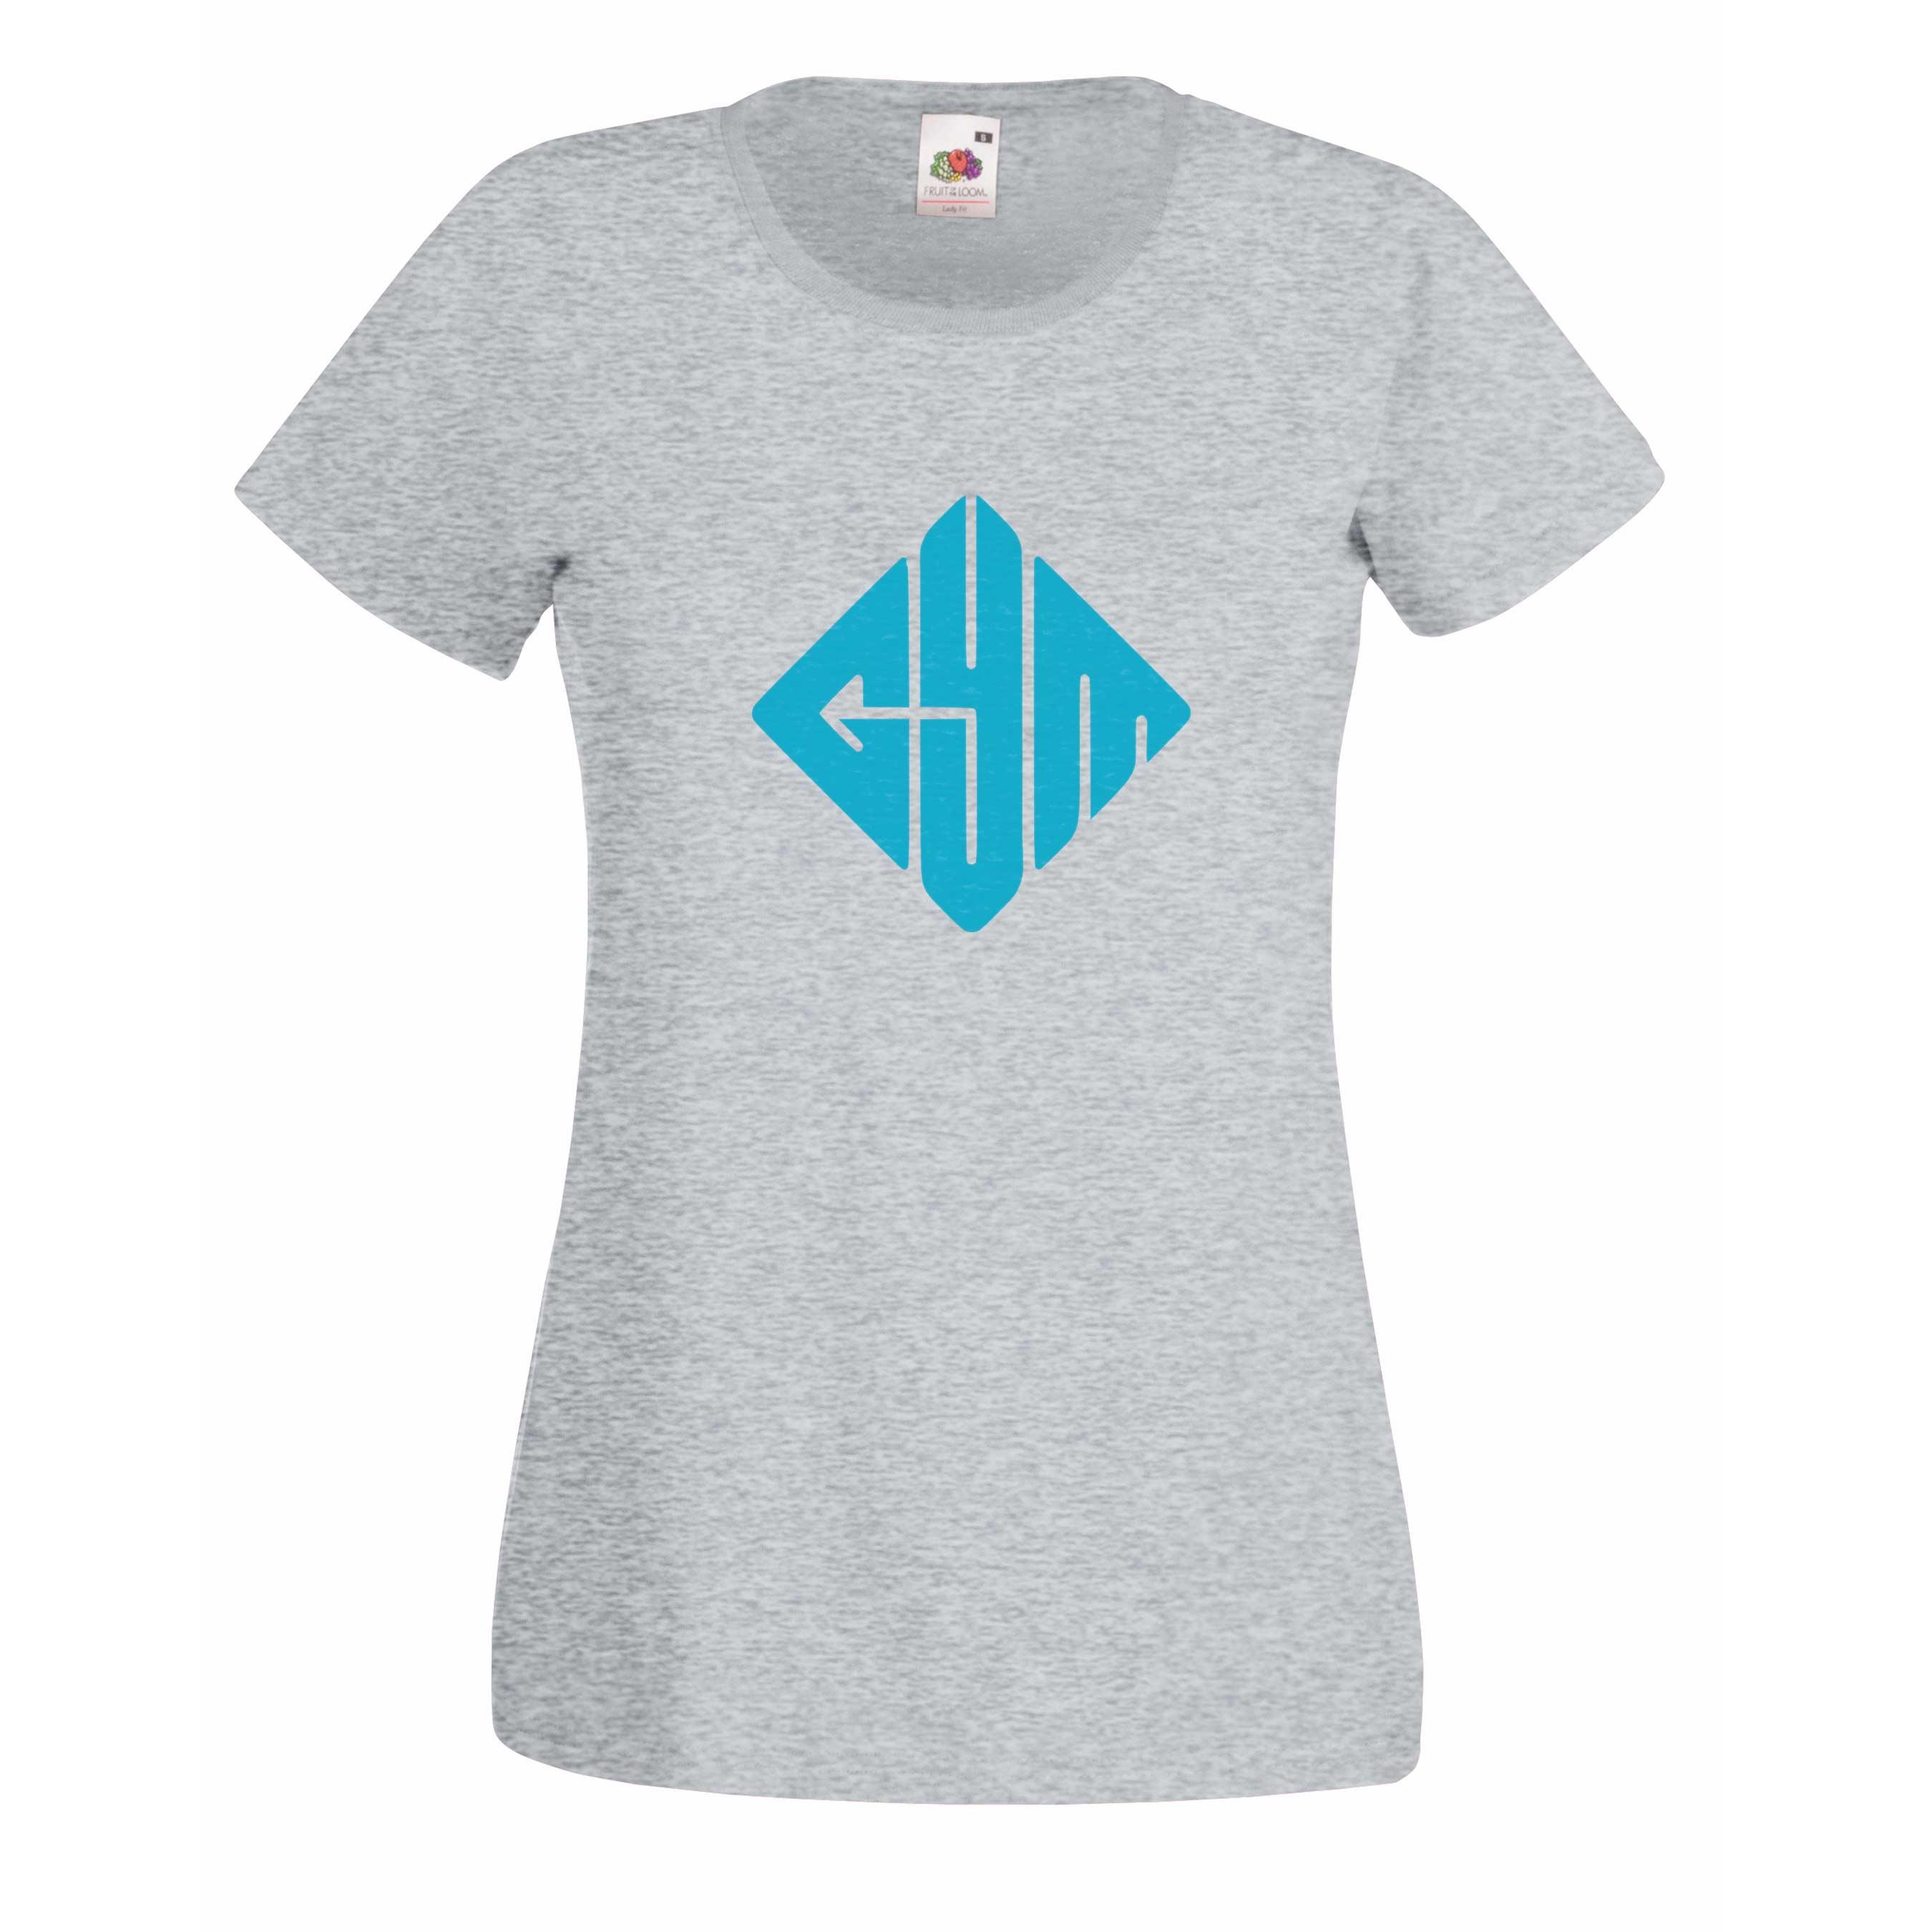 Gym design for t-shirt, hoodie & sweatshirt